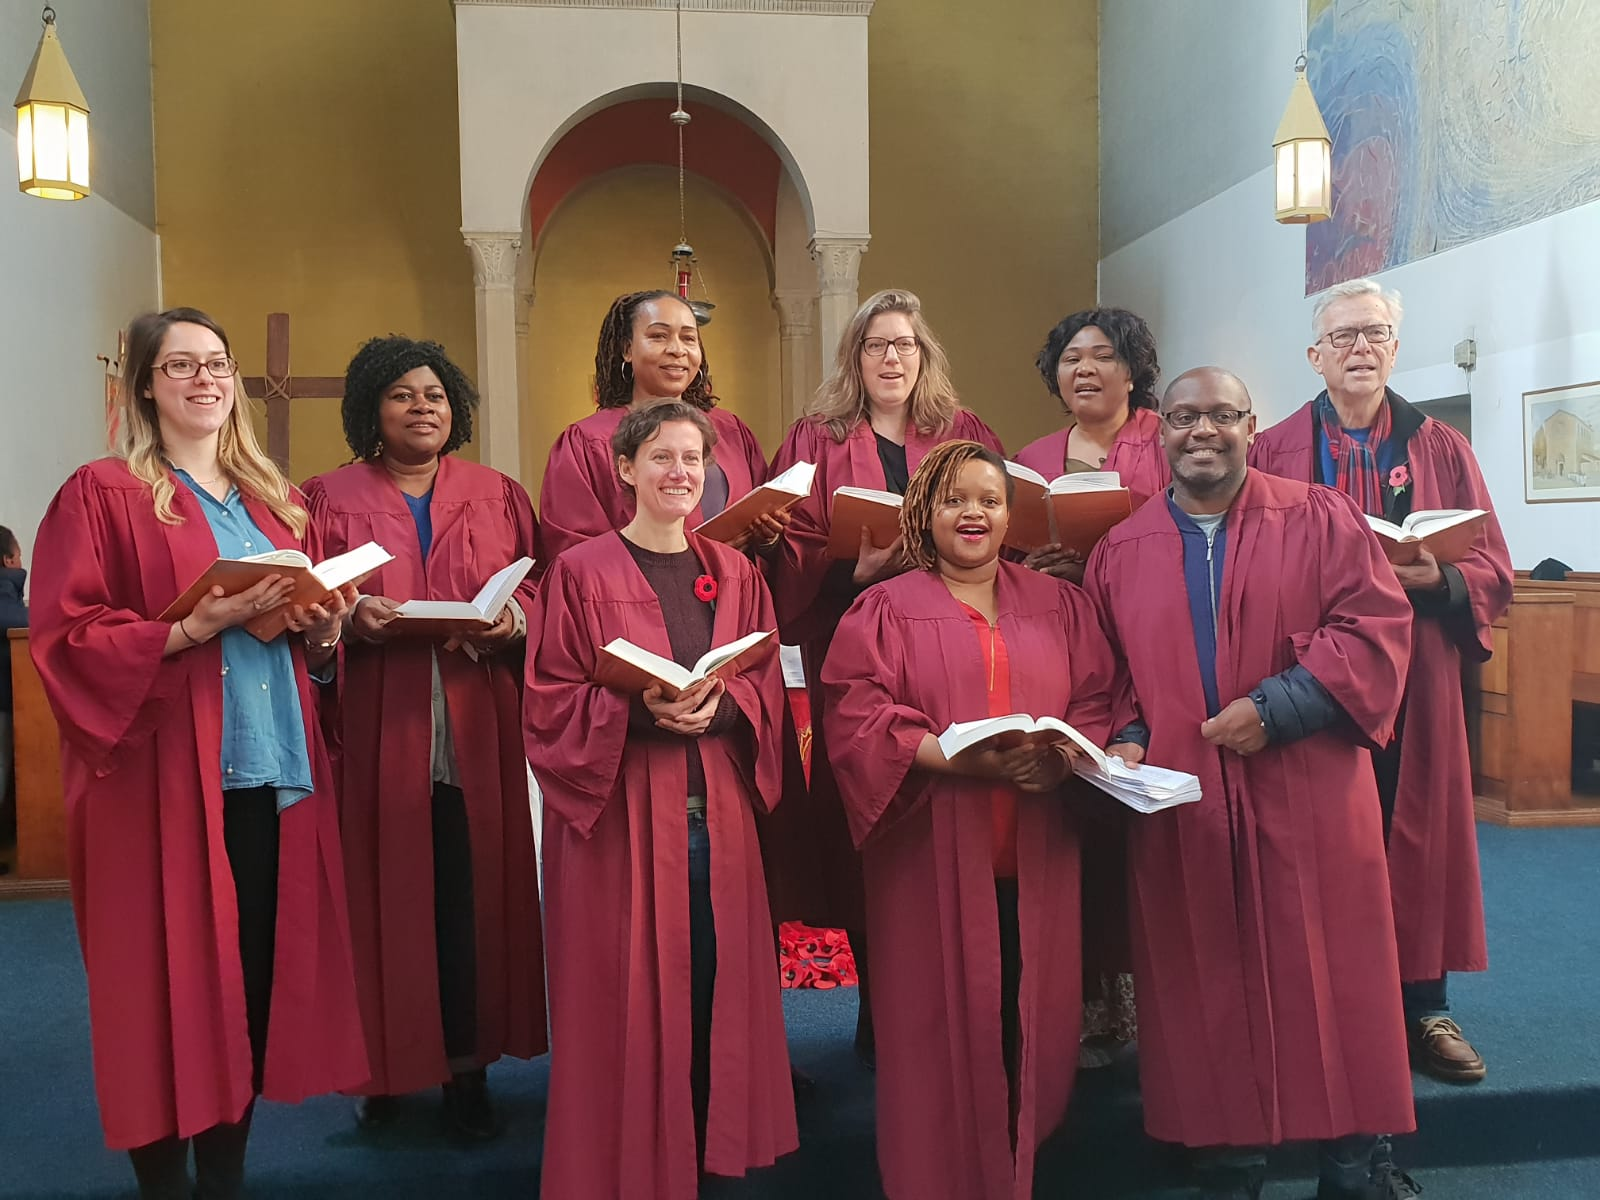 Sunday morning choir at St Anselm's